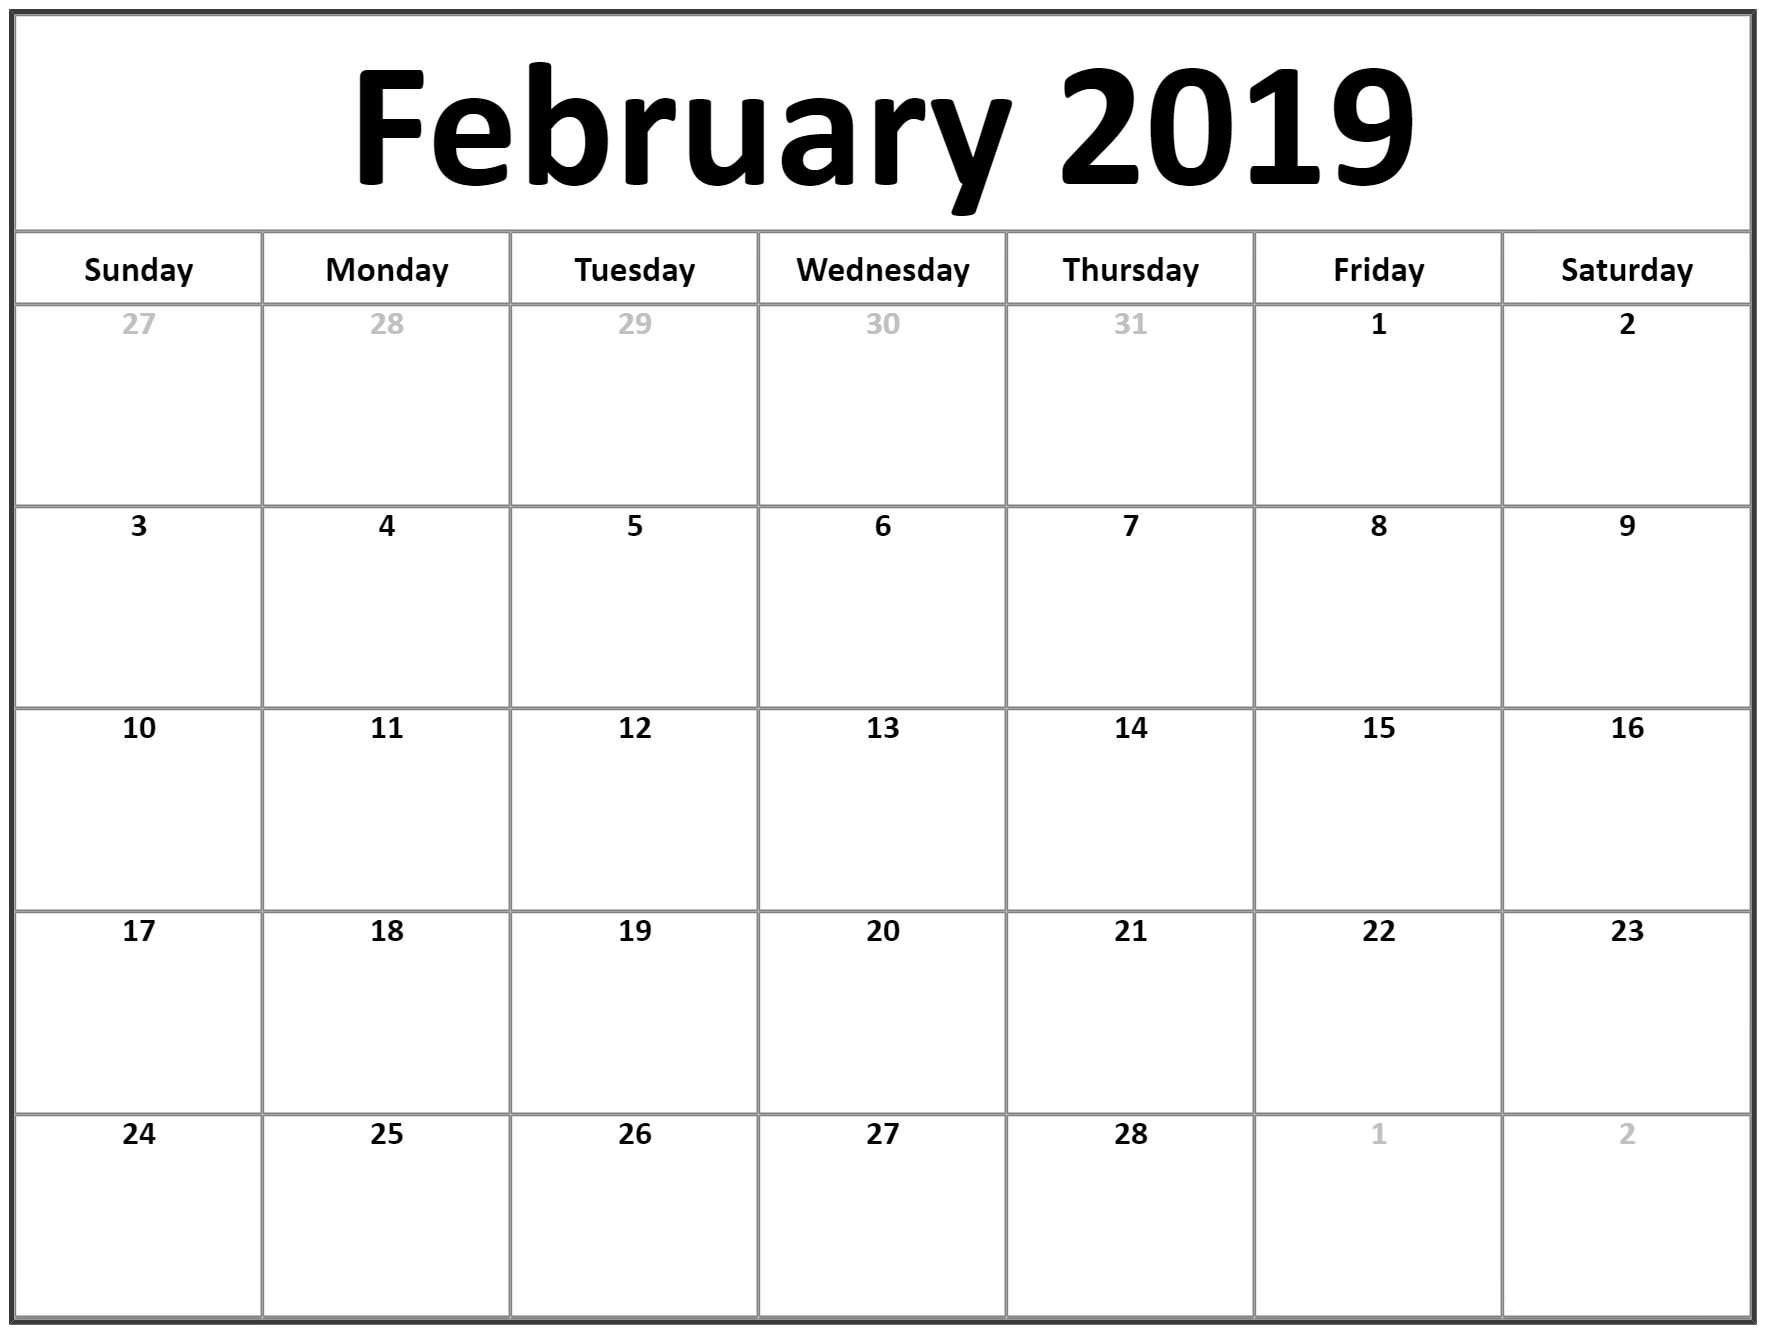 February Calendar 2019 For Office   February Calendar 2019-Free Fillable 2020 Calendar Template